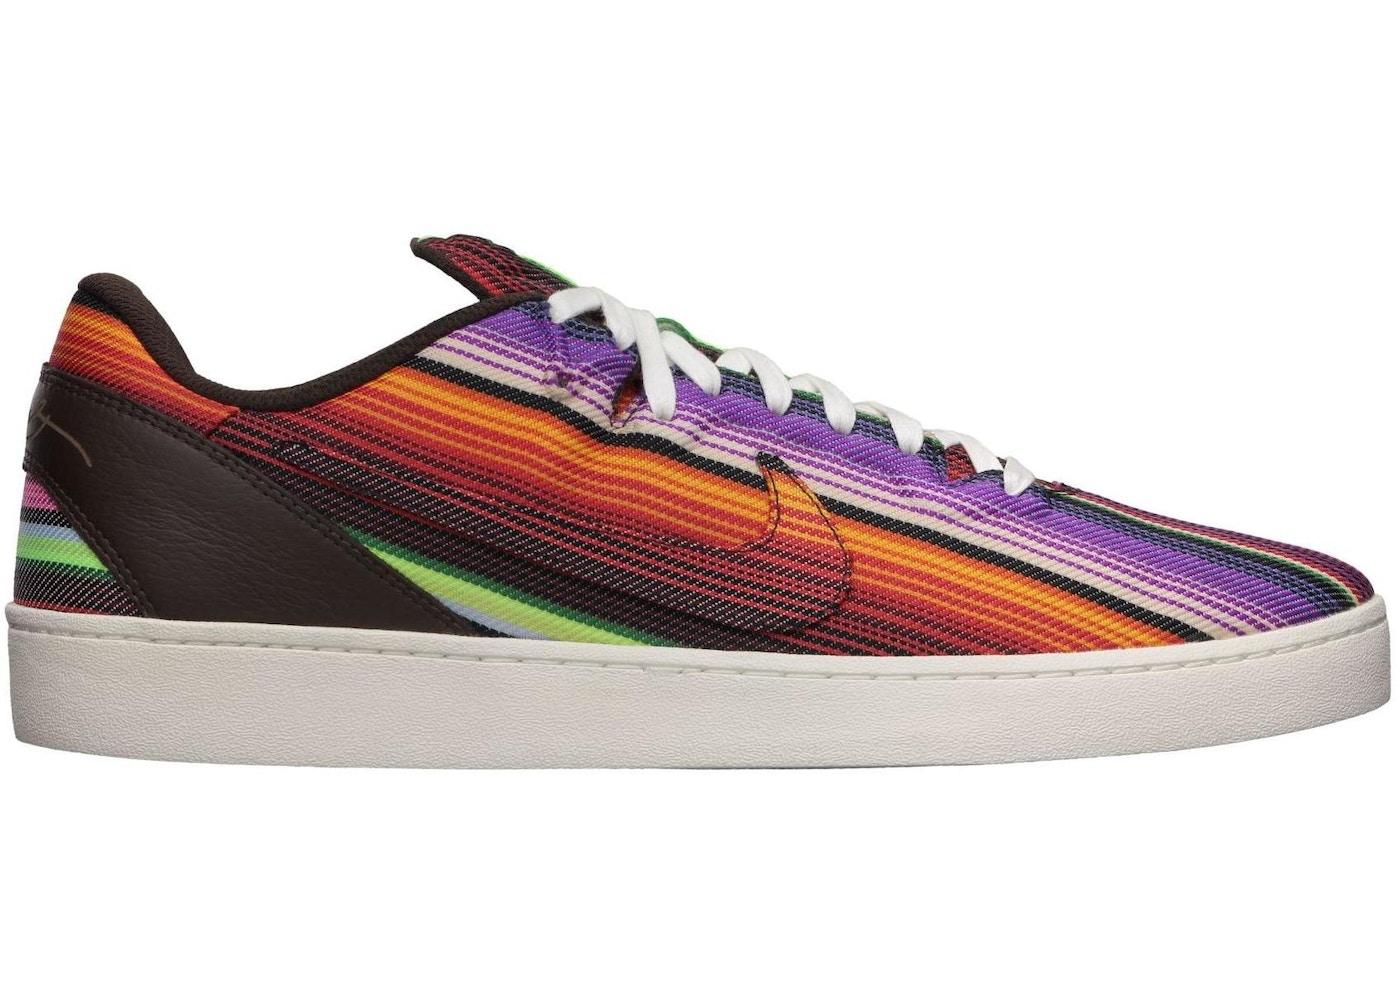 hot sale online 6bae3 52897 Nike Kobe 8 Shoes - Release Date